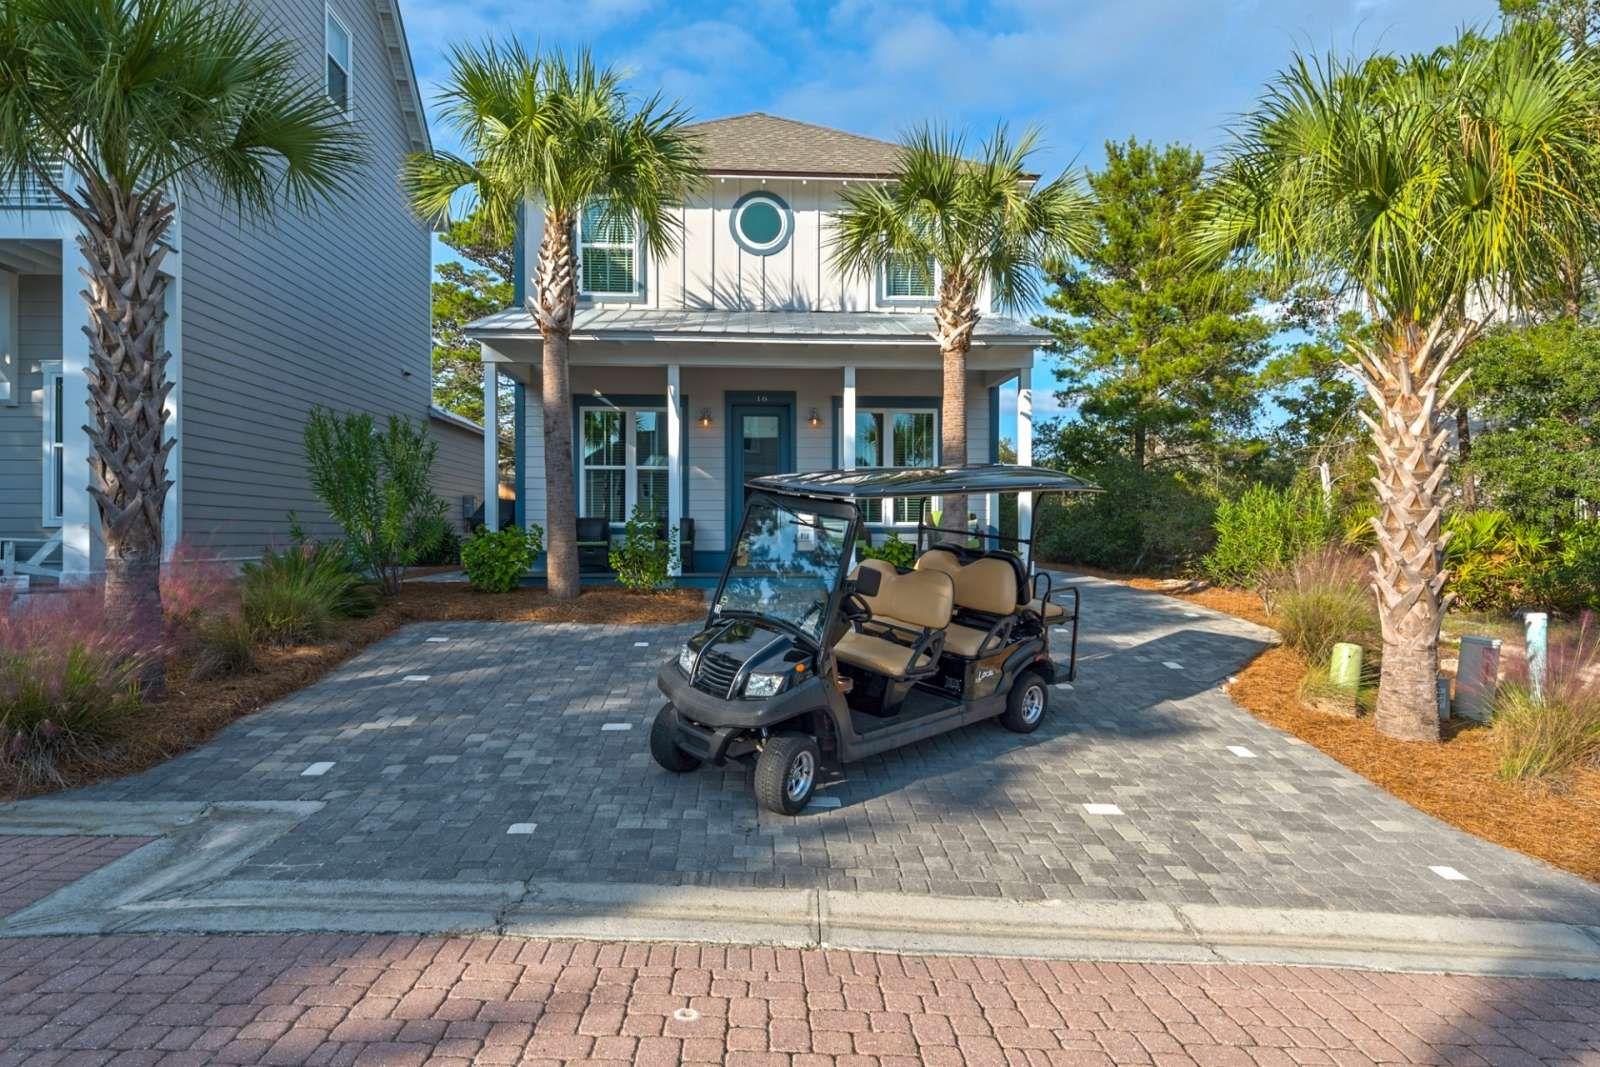 19+ Blue mountain beach florida golf cart rentals ideas in 2021